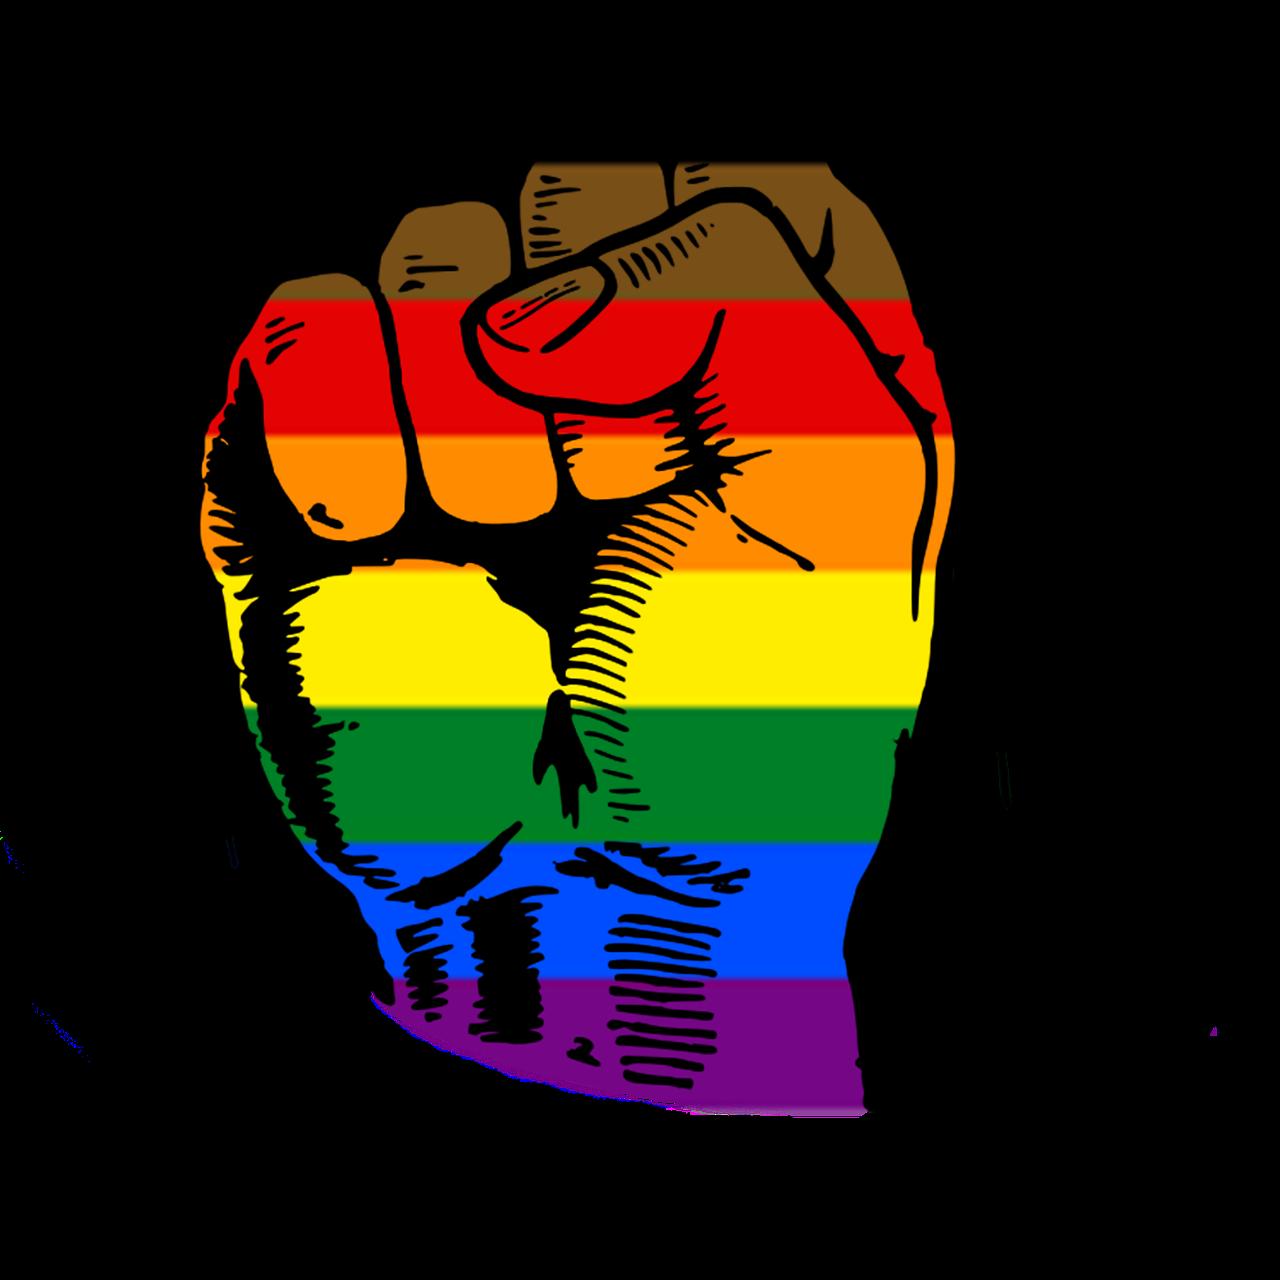 Pride Fist Power Human - Free image on Pixabay